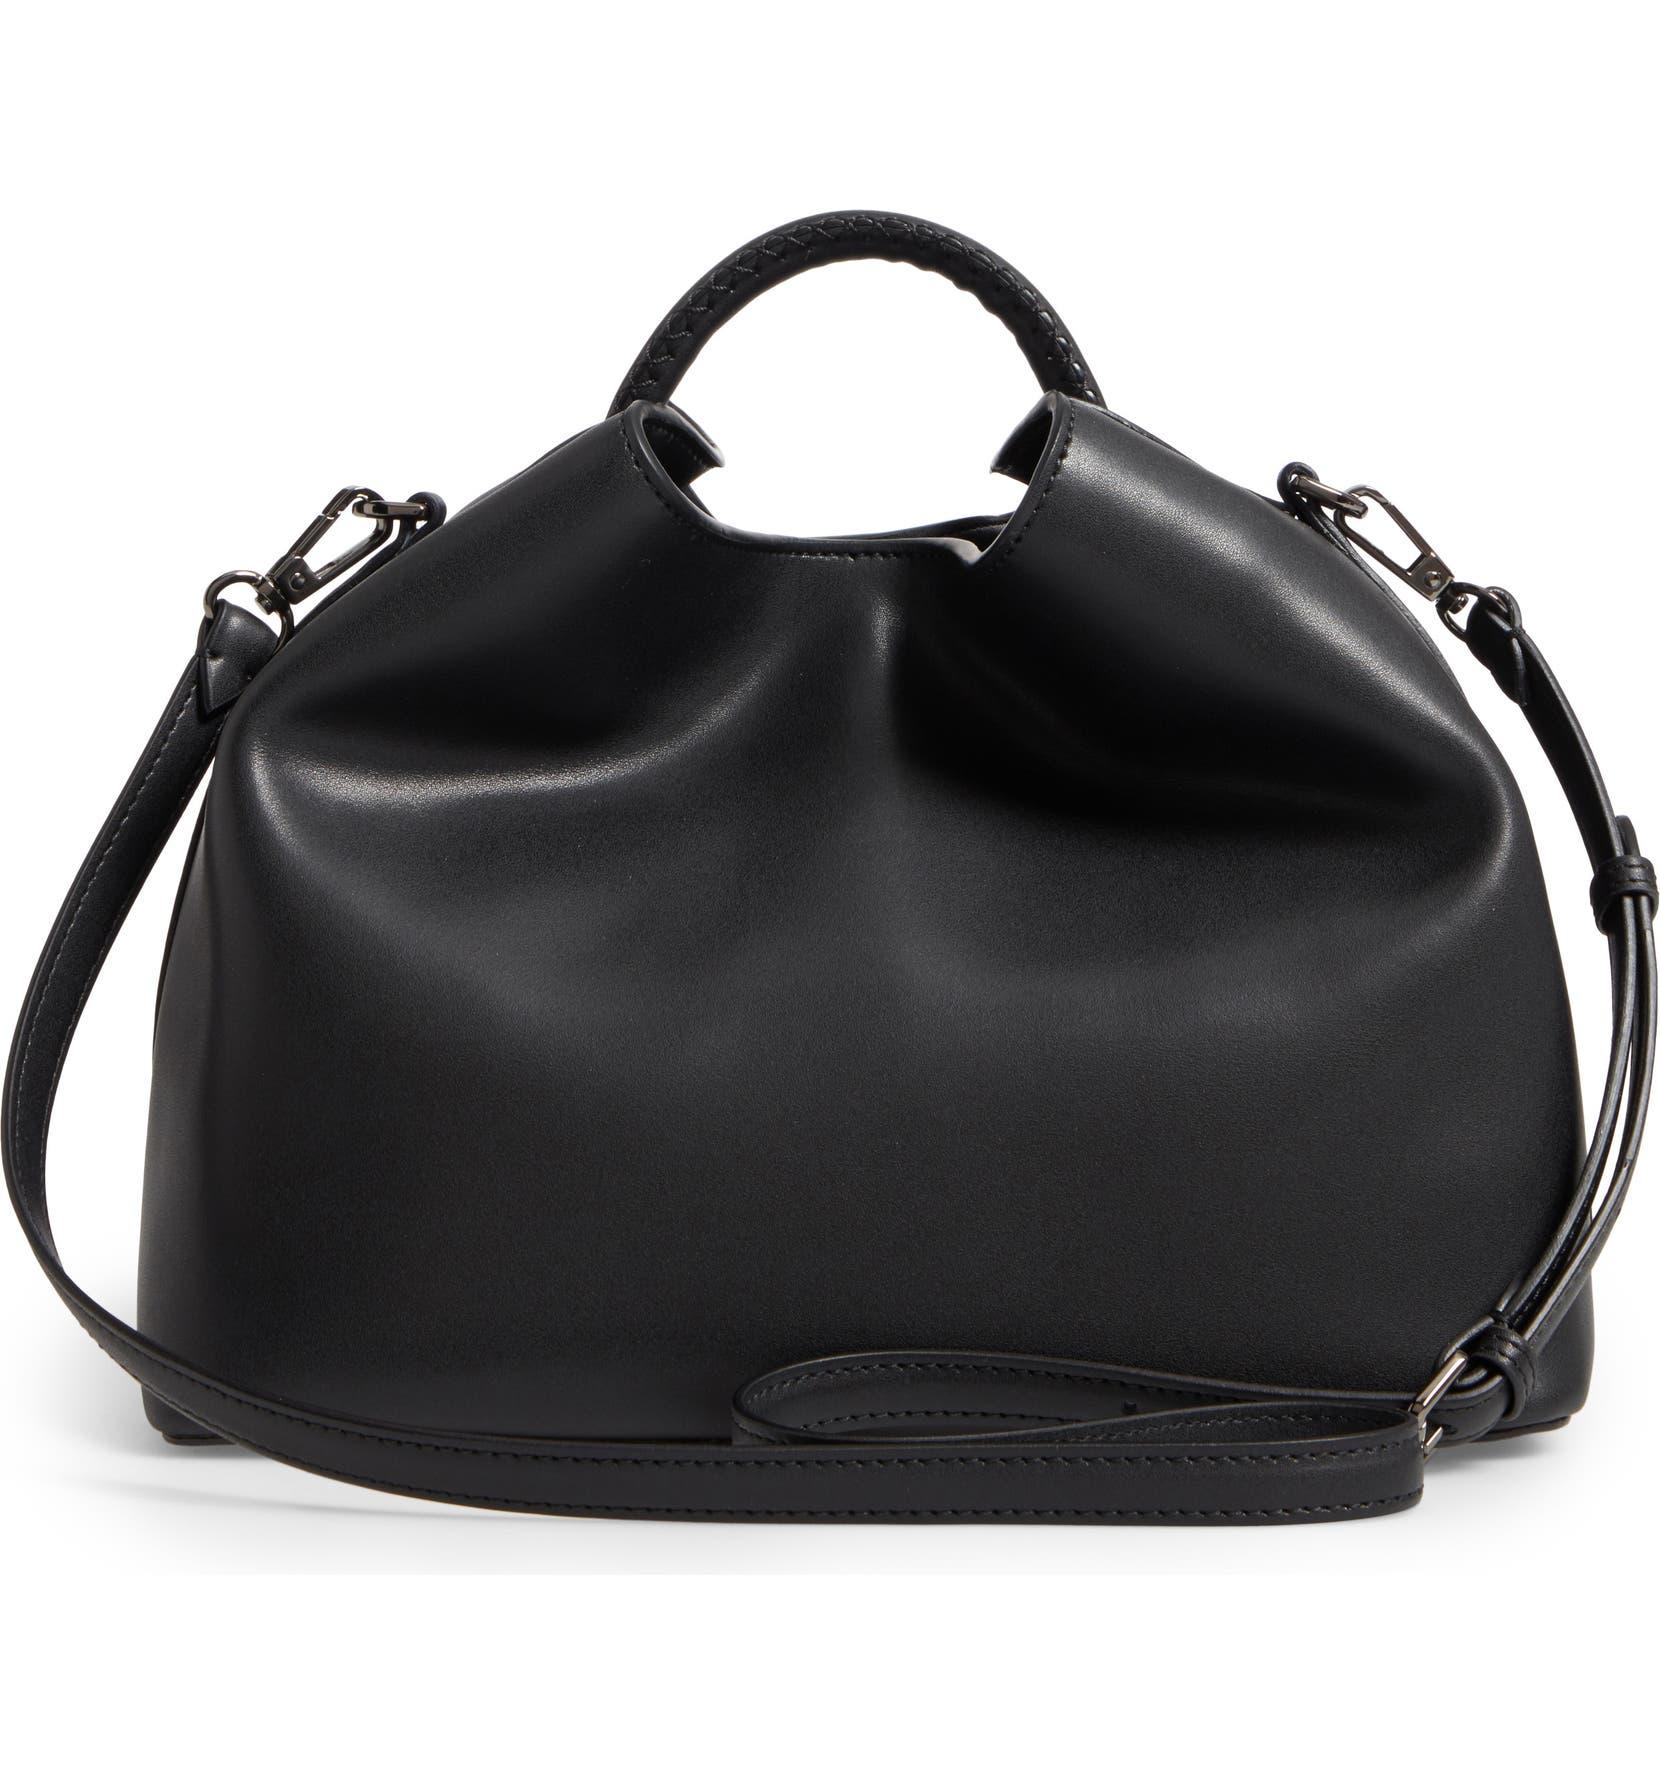 84aca38cb634 Elleme Raisin Leather Handbag   Nordstrom